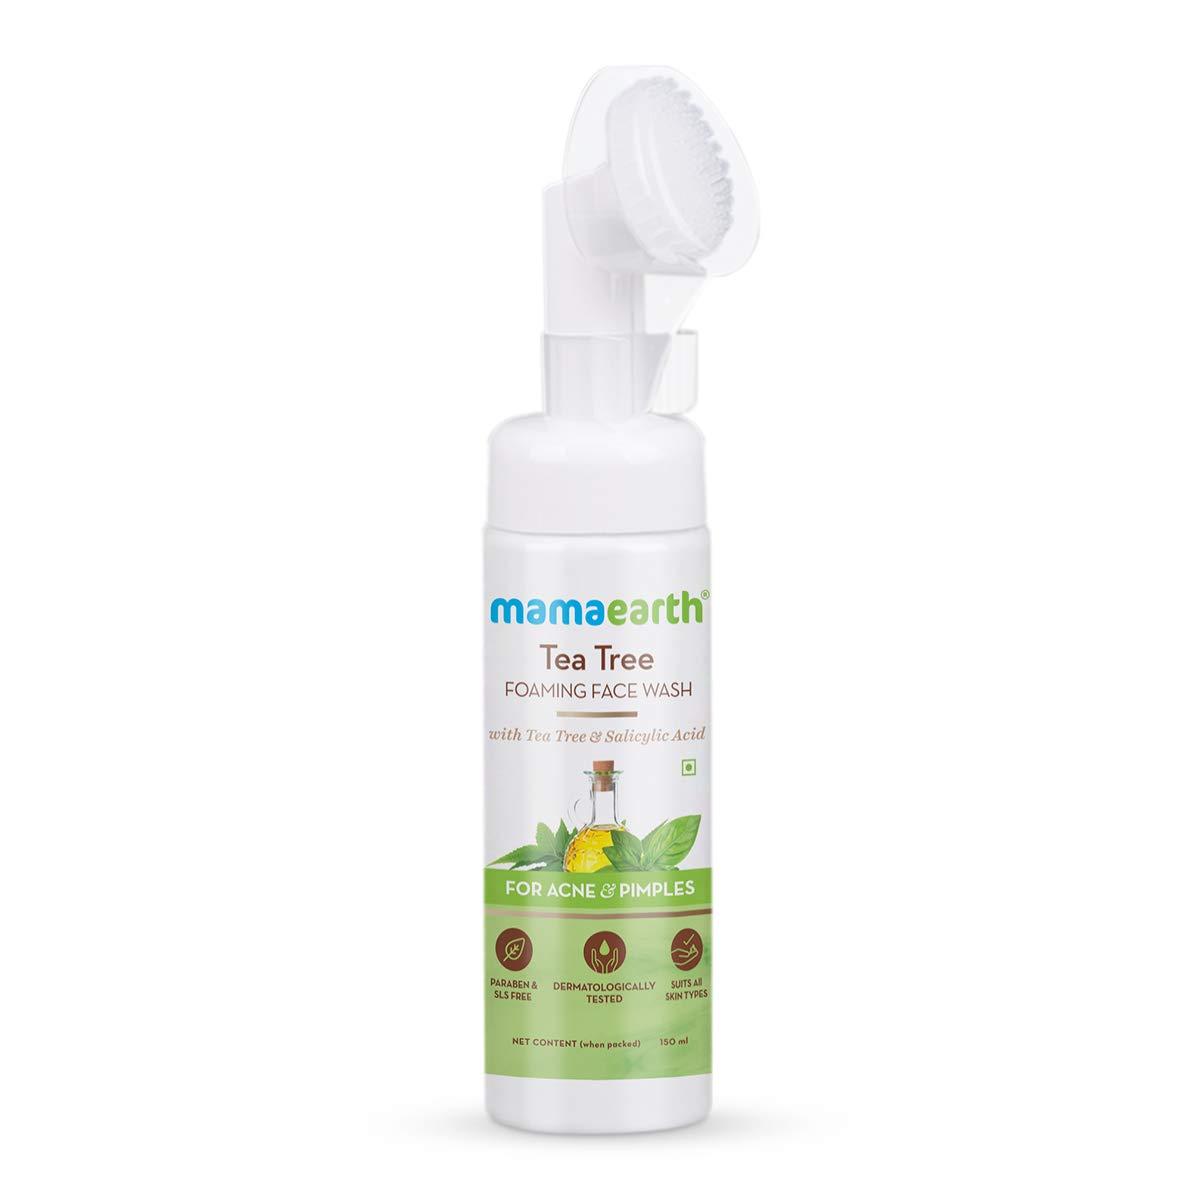 Mamaearth Tea Tree Foaming Face Wash with Tea Tree & Salicylic Acid for Acne & Pimples